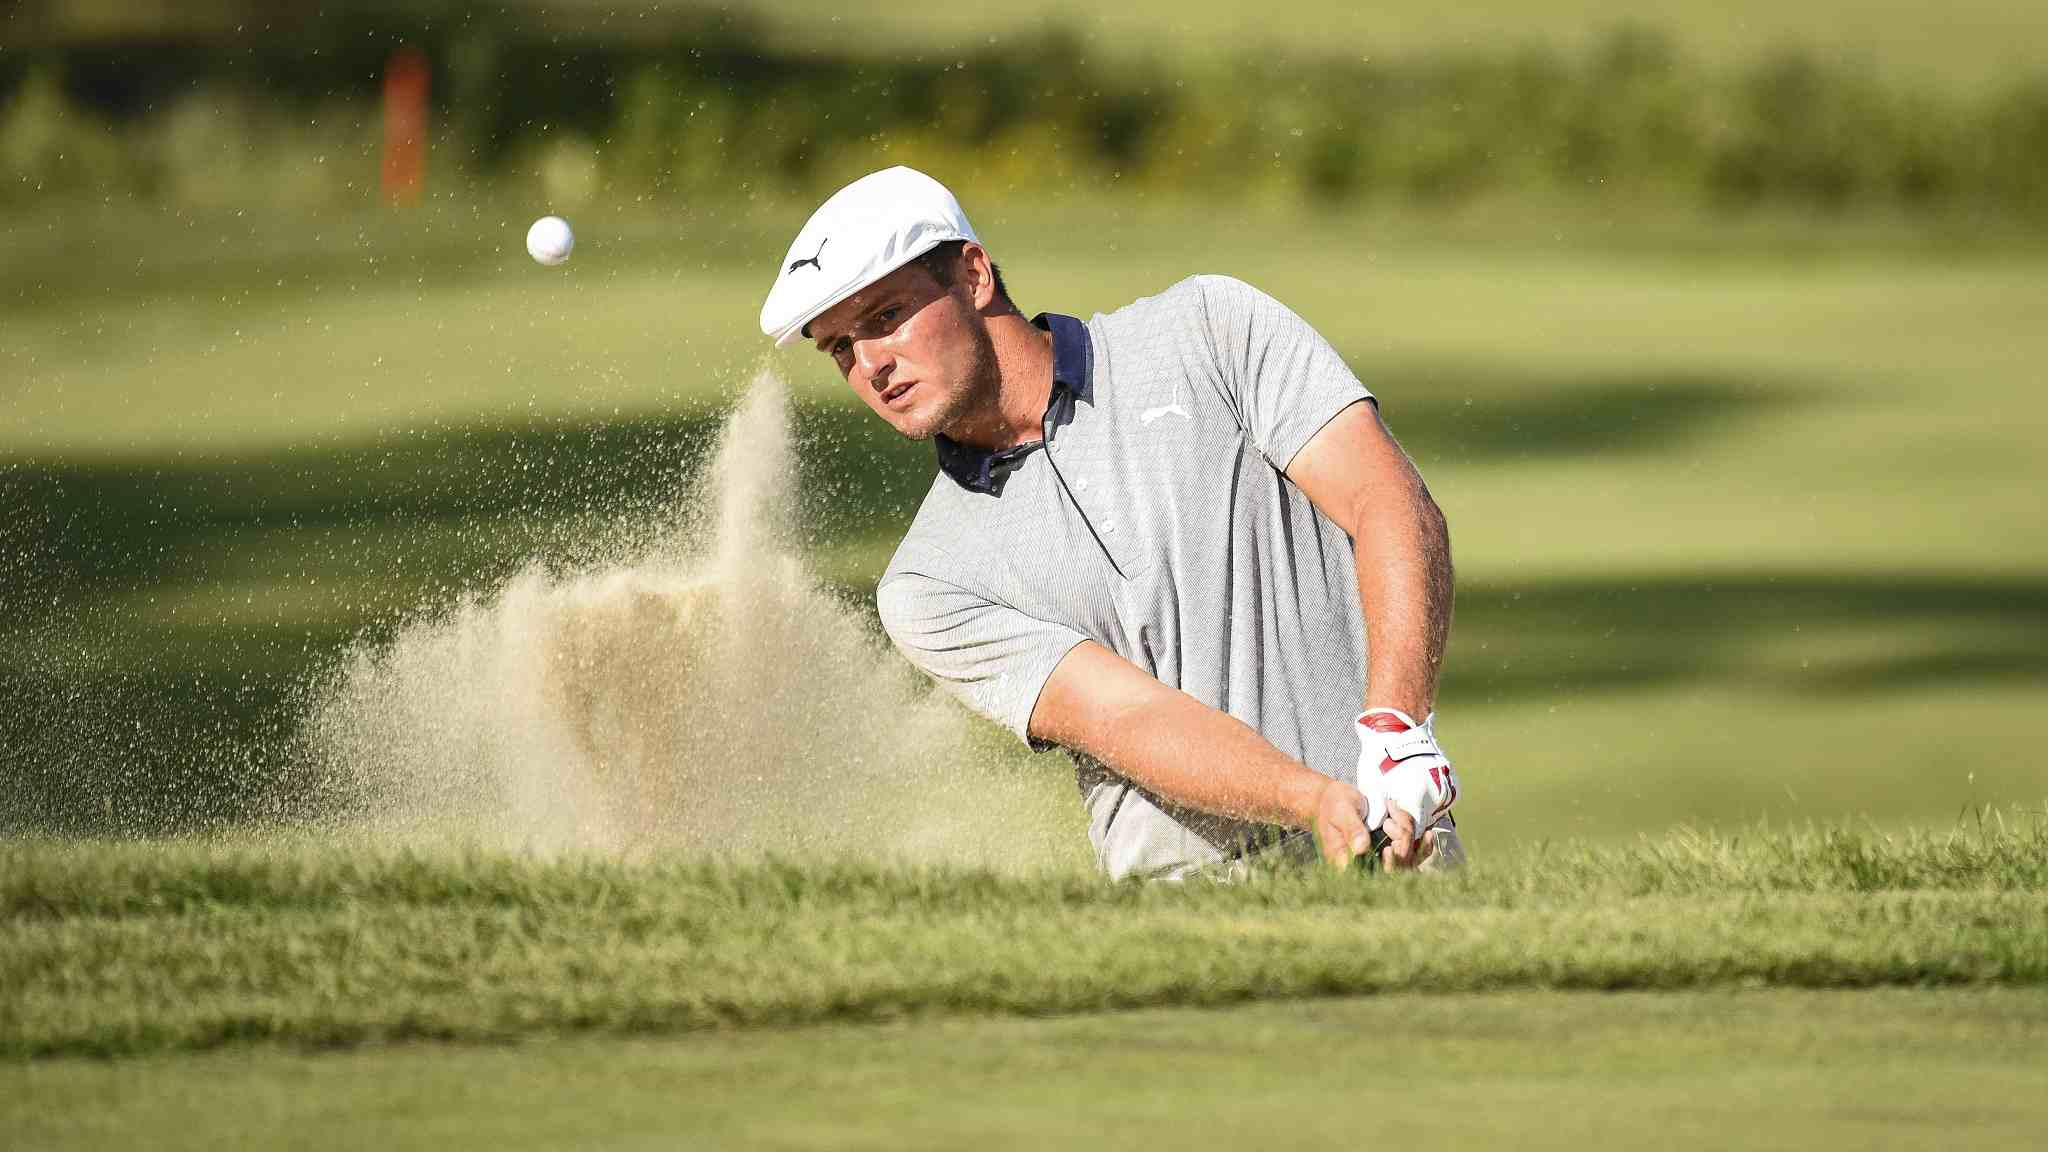 American golfer DeChambeau eyes Ryder berth after Boston win